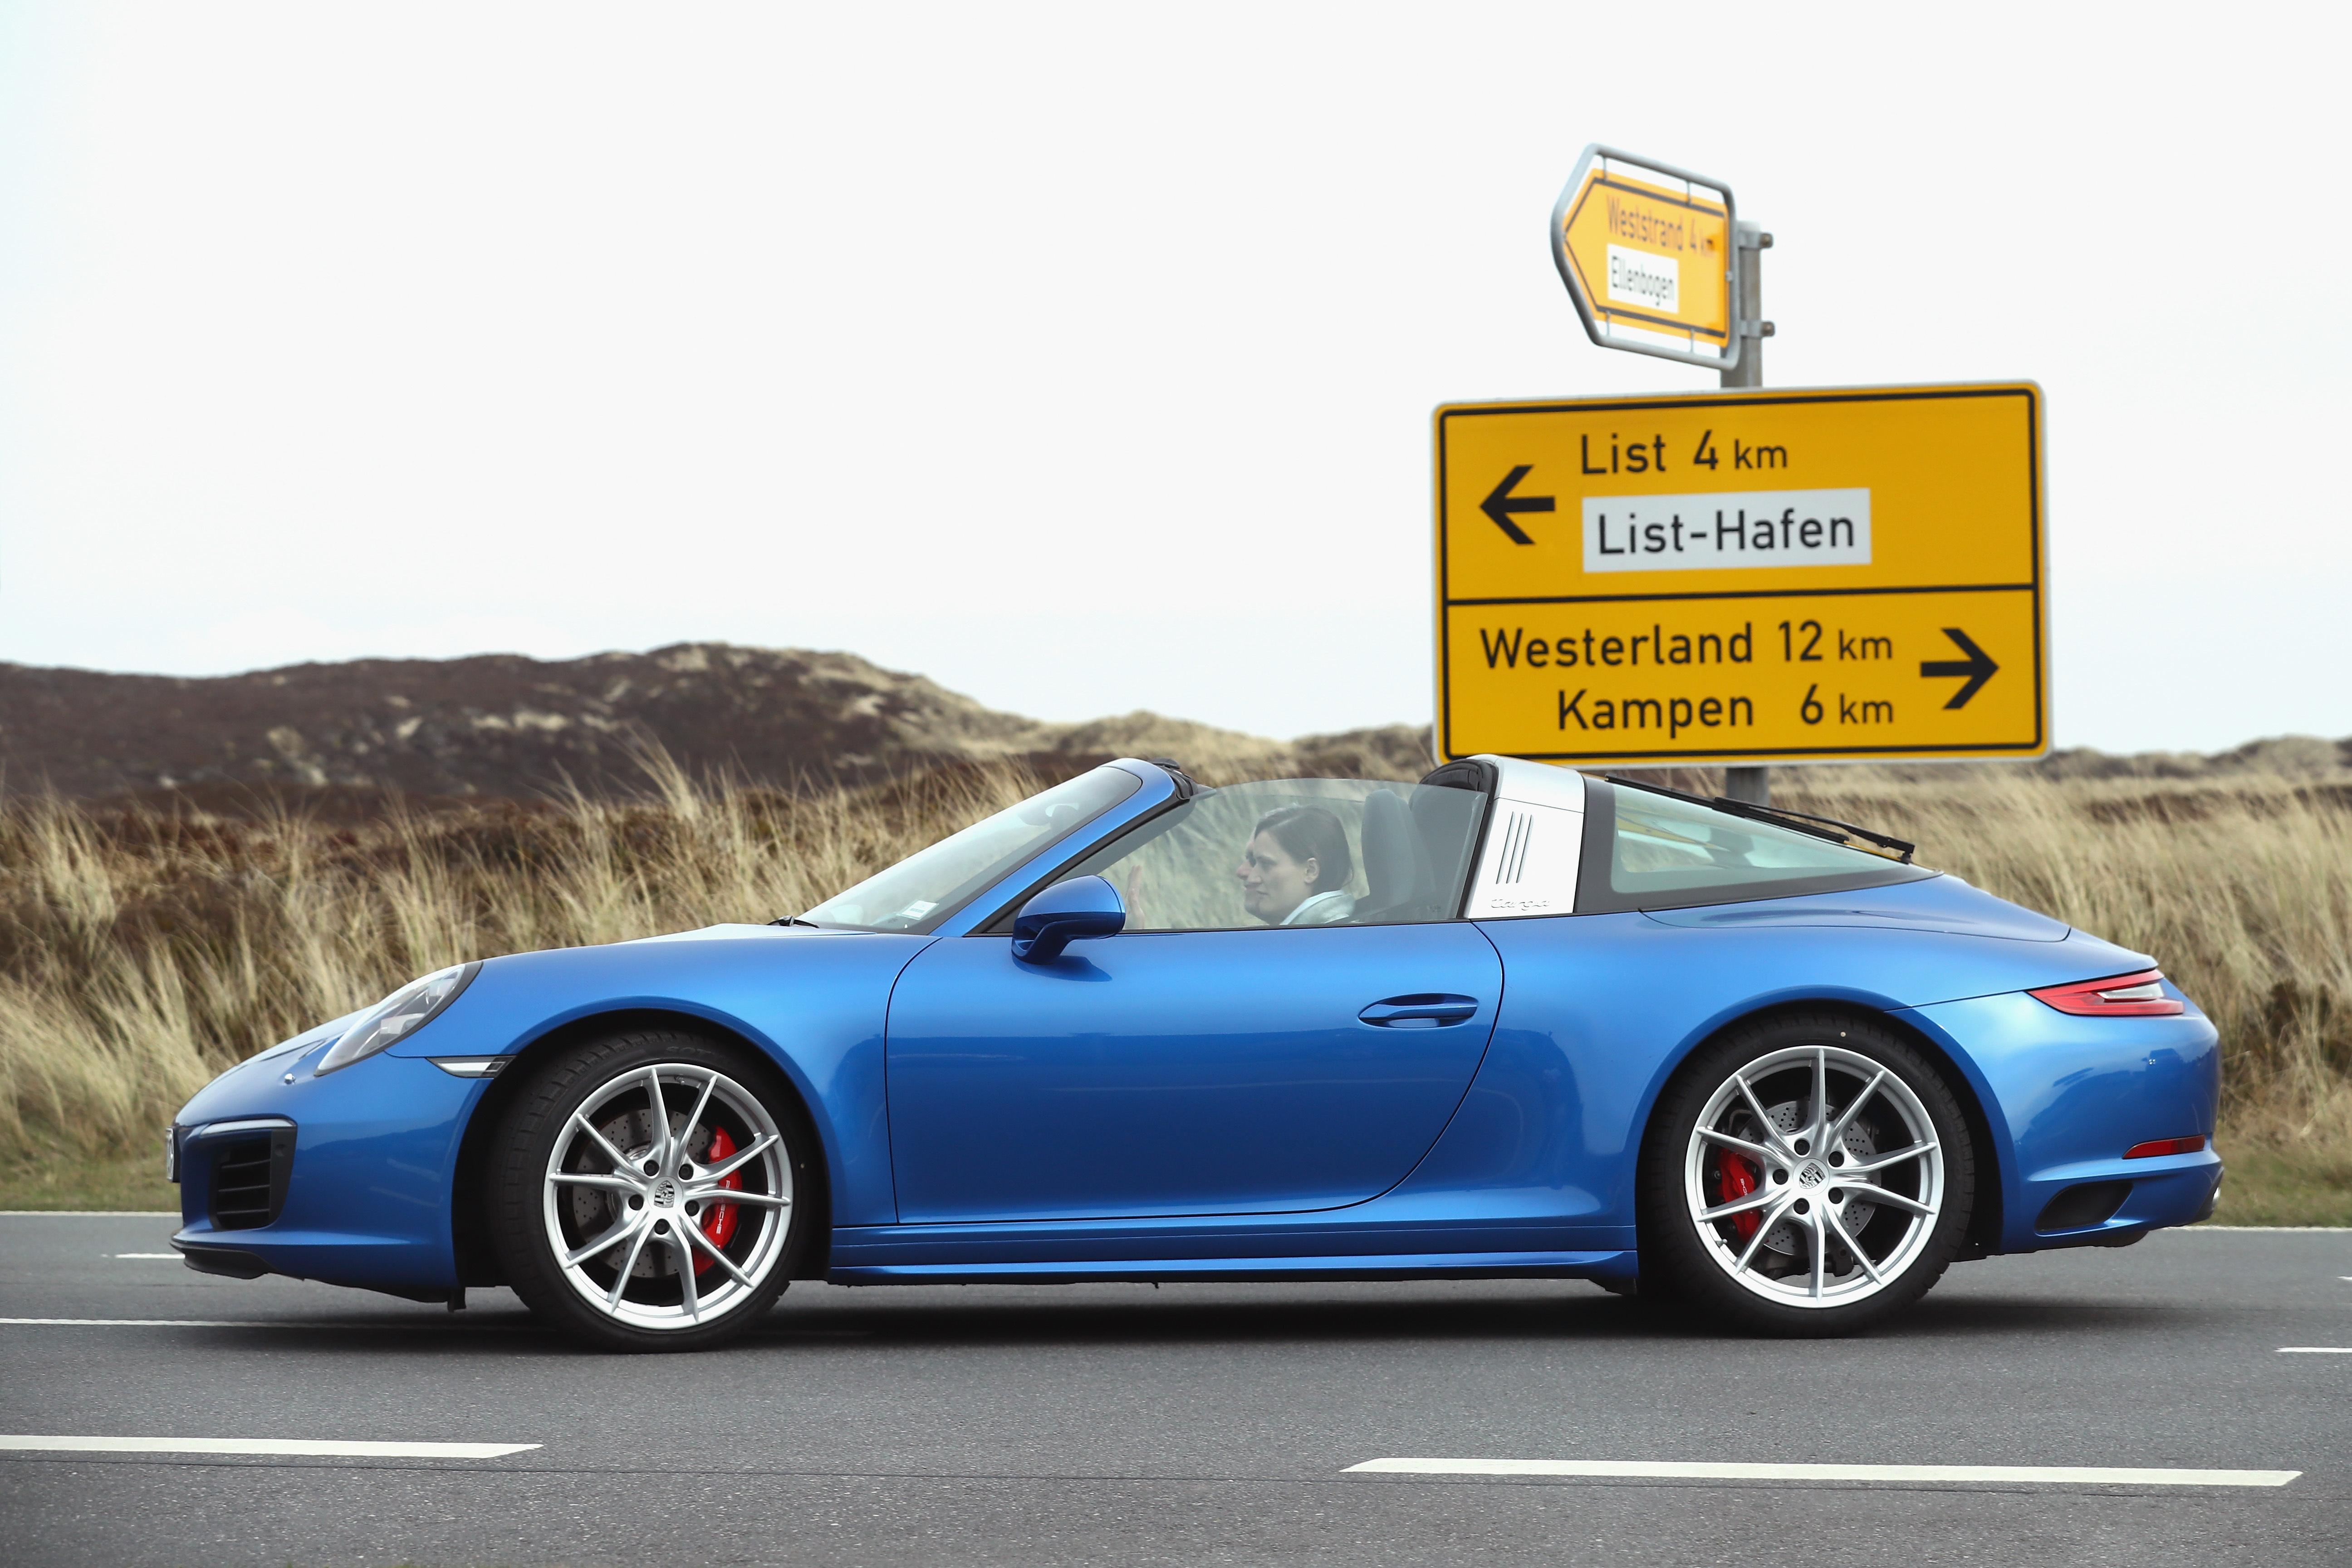 Porsche Will Never Build a Fully Autonomous Car